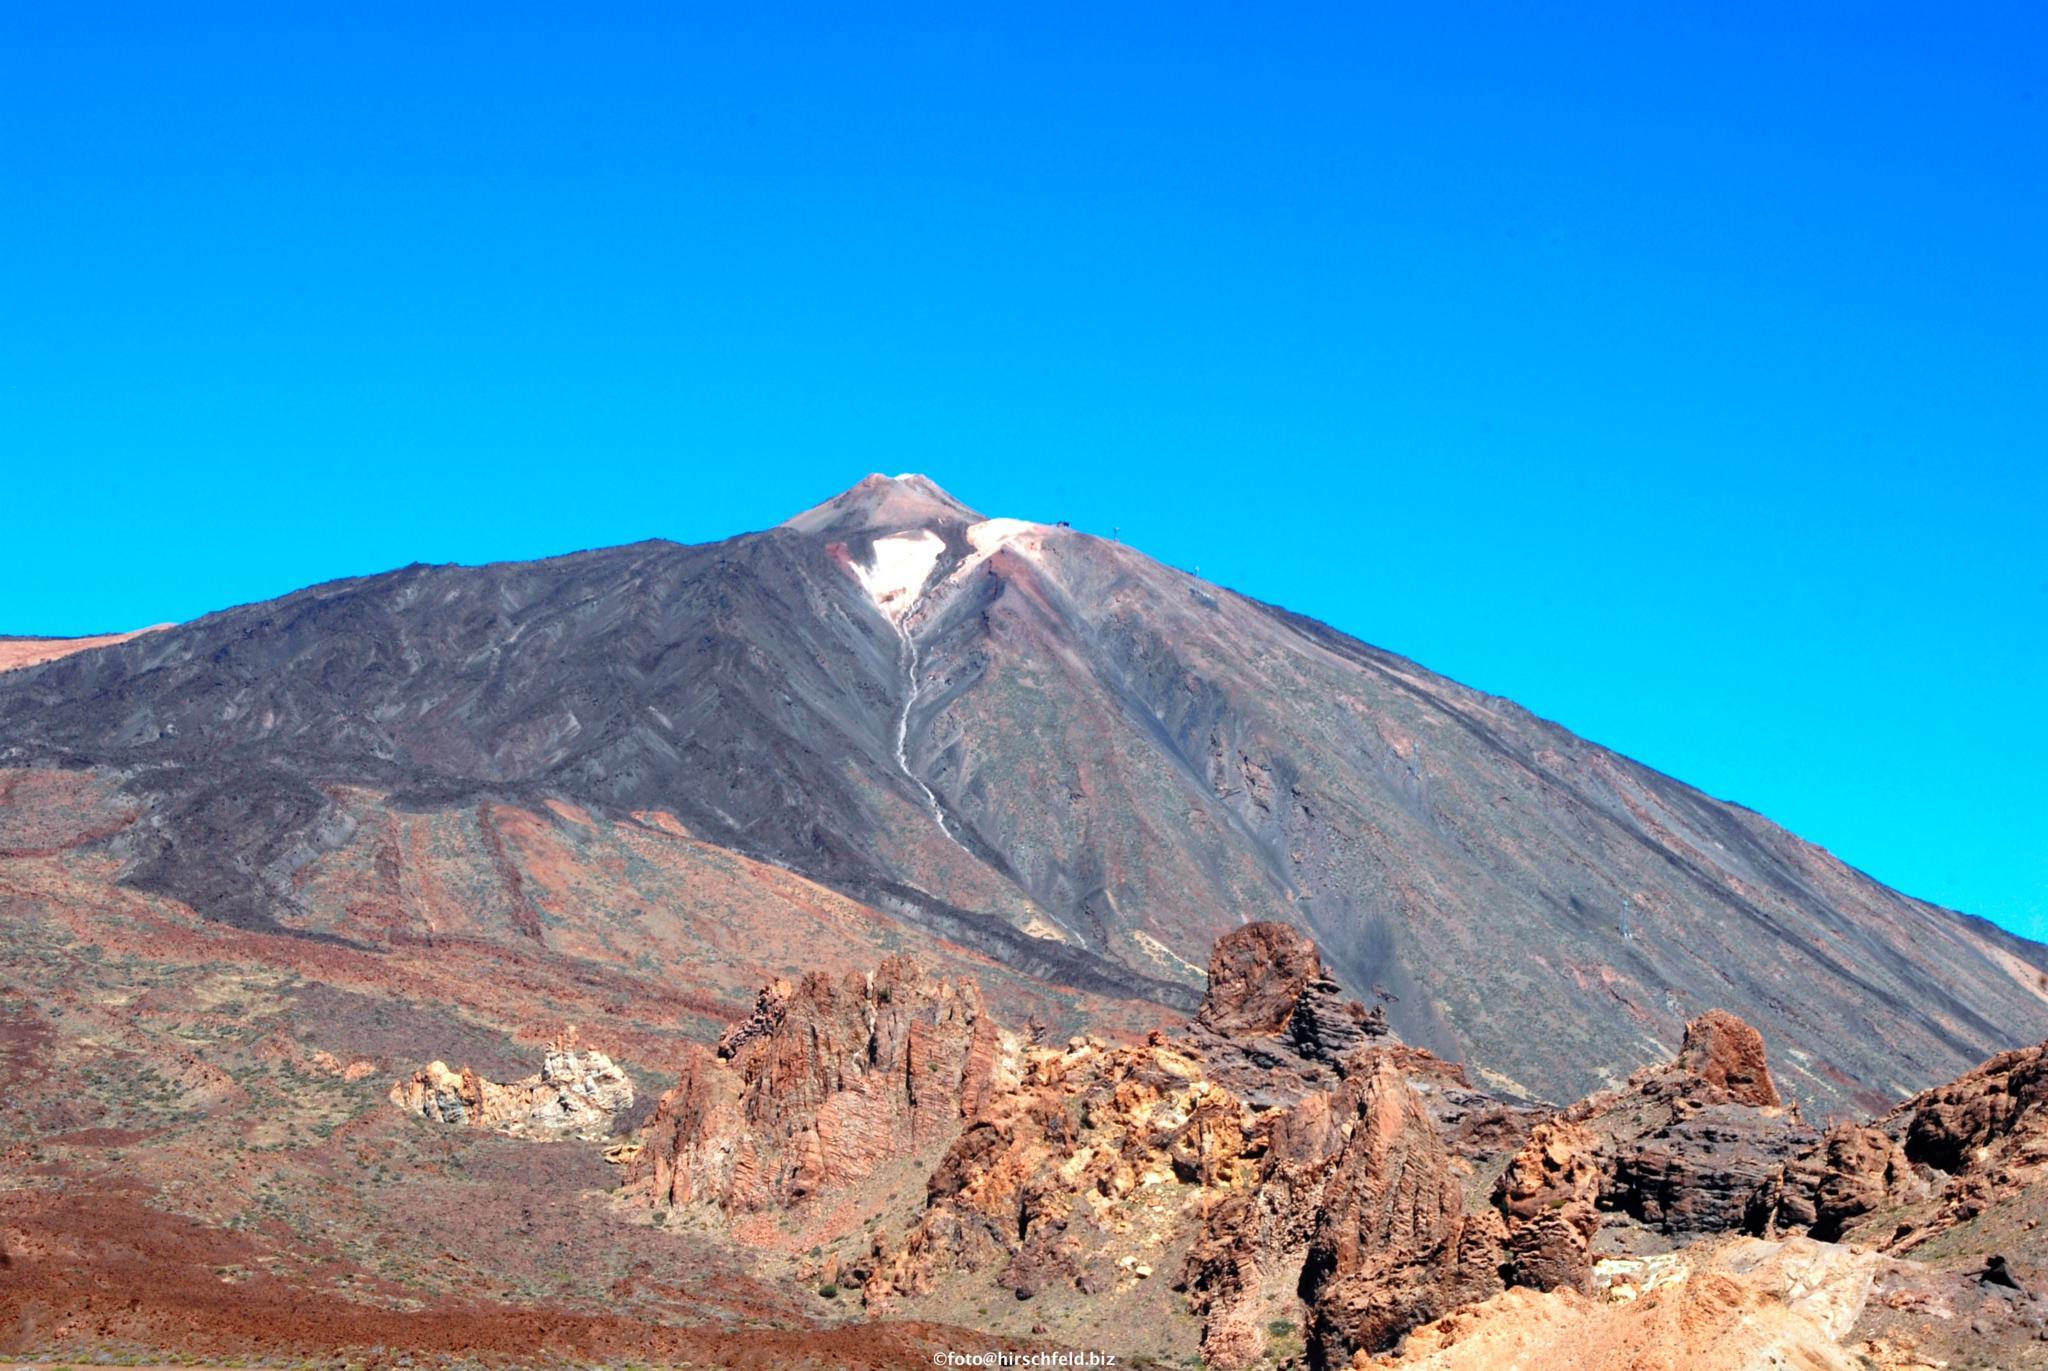 Teide, Santa Cruz de Tenerife, Spain by edmund hirschfeld